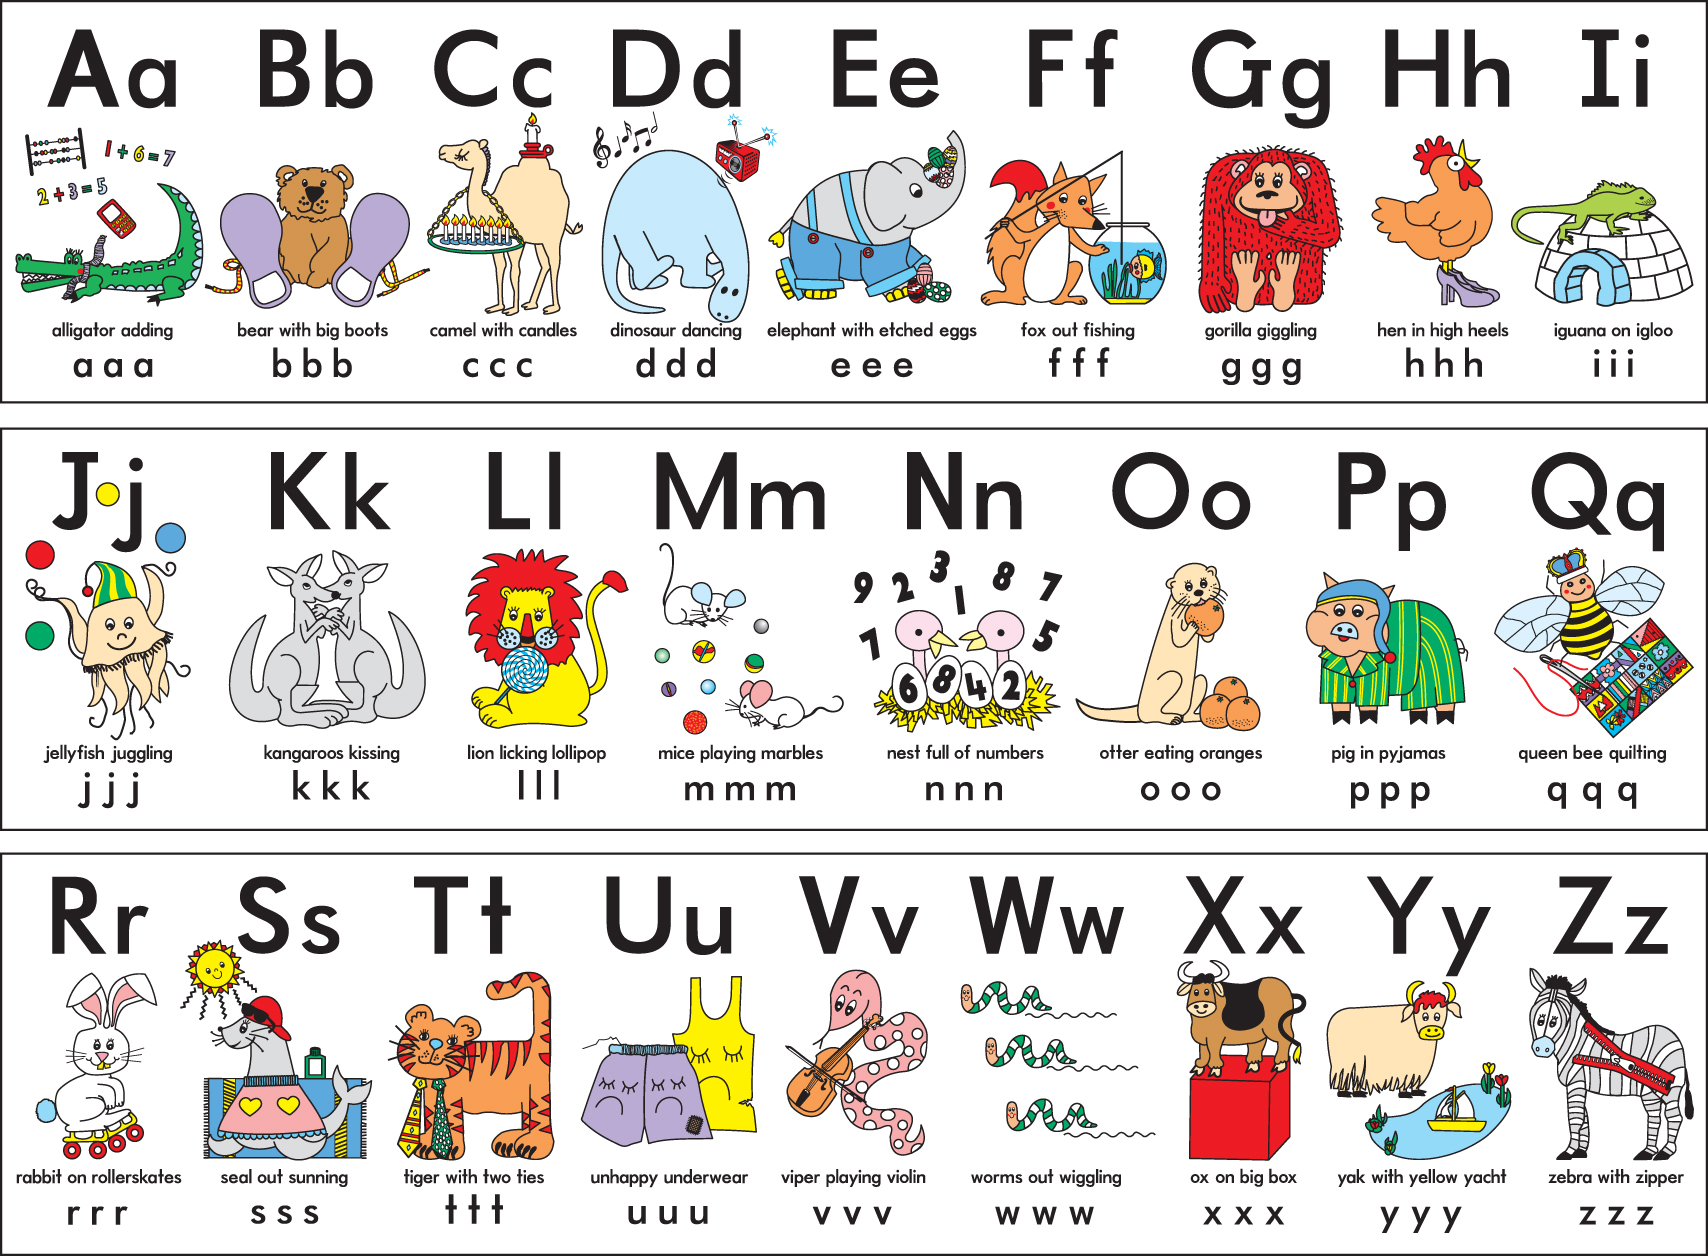 The Alphabet.